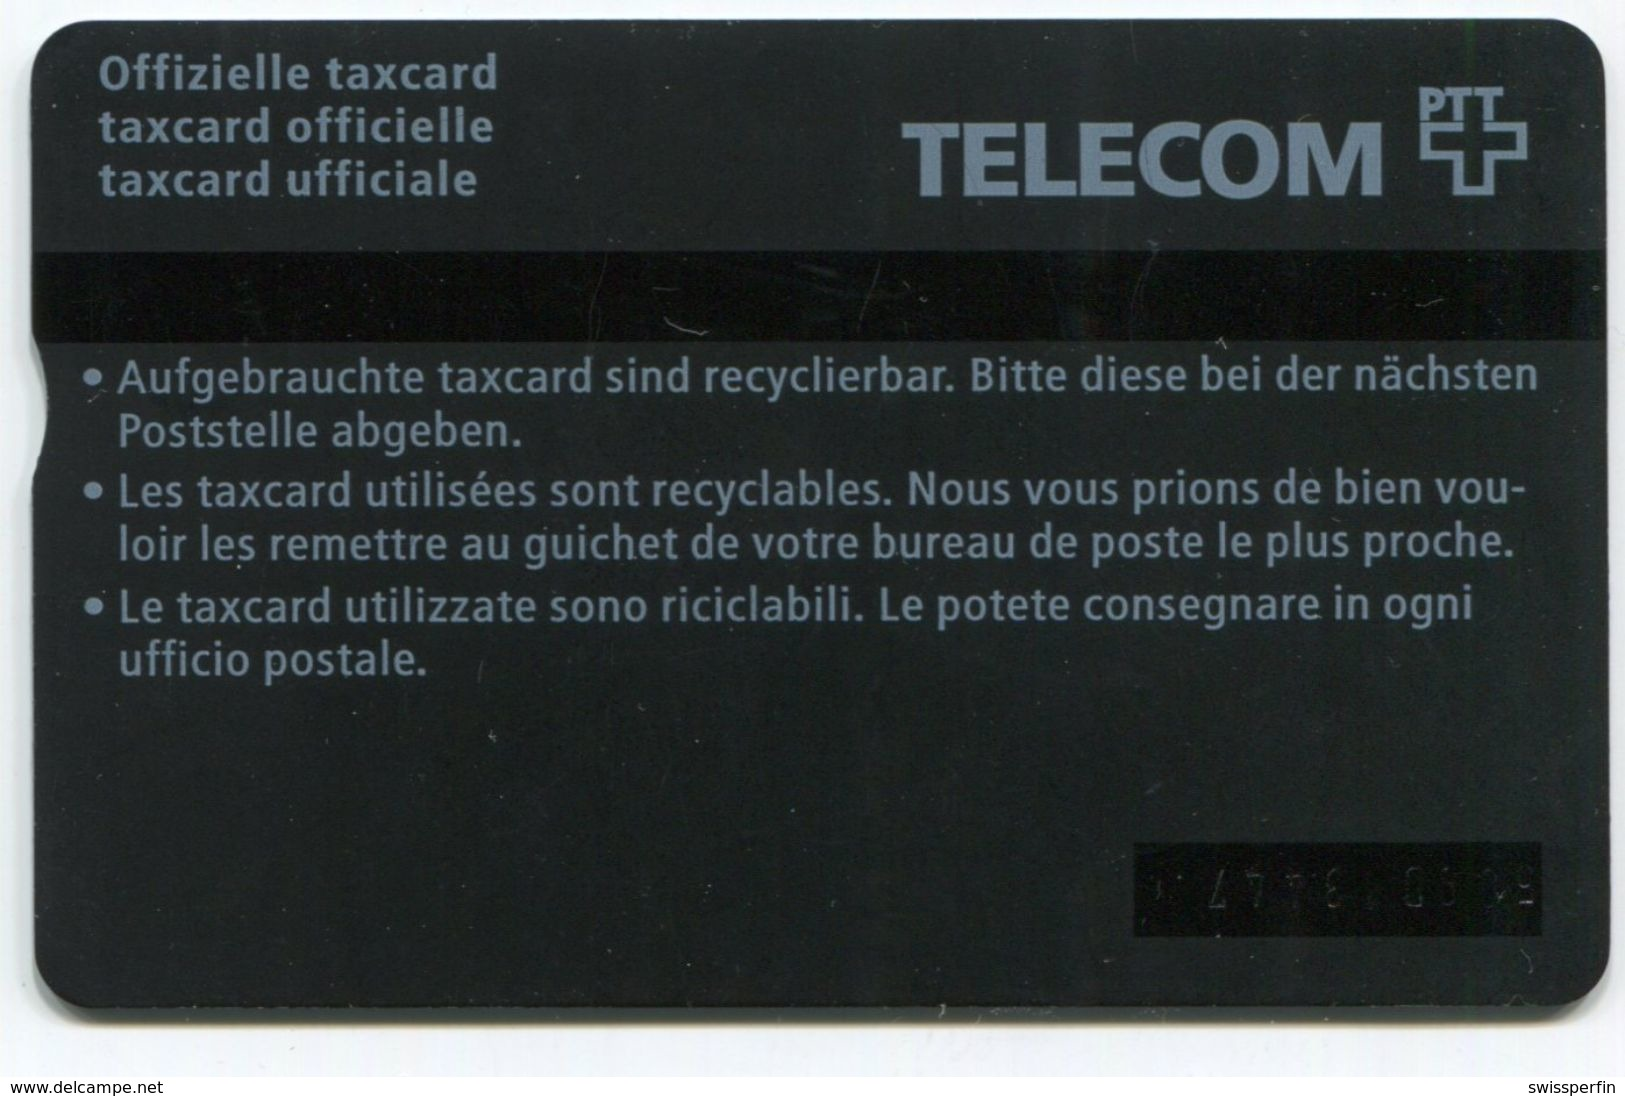 1749 - 10 CHF Älteres Paar - ABART Farbstrich - Gebrauchte Schalterkarte - Schweiz